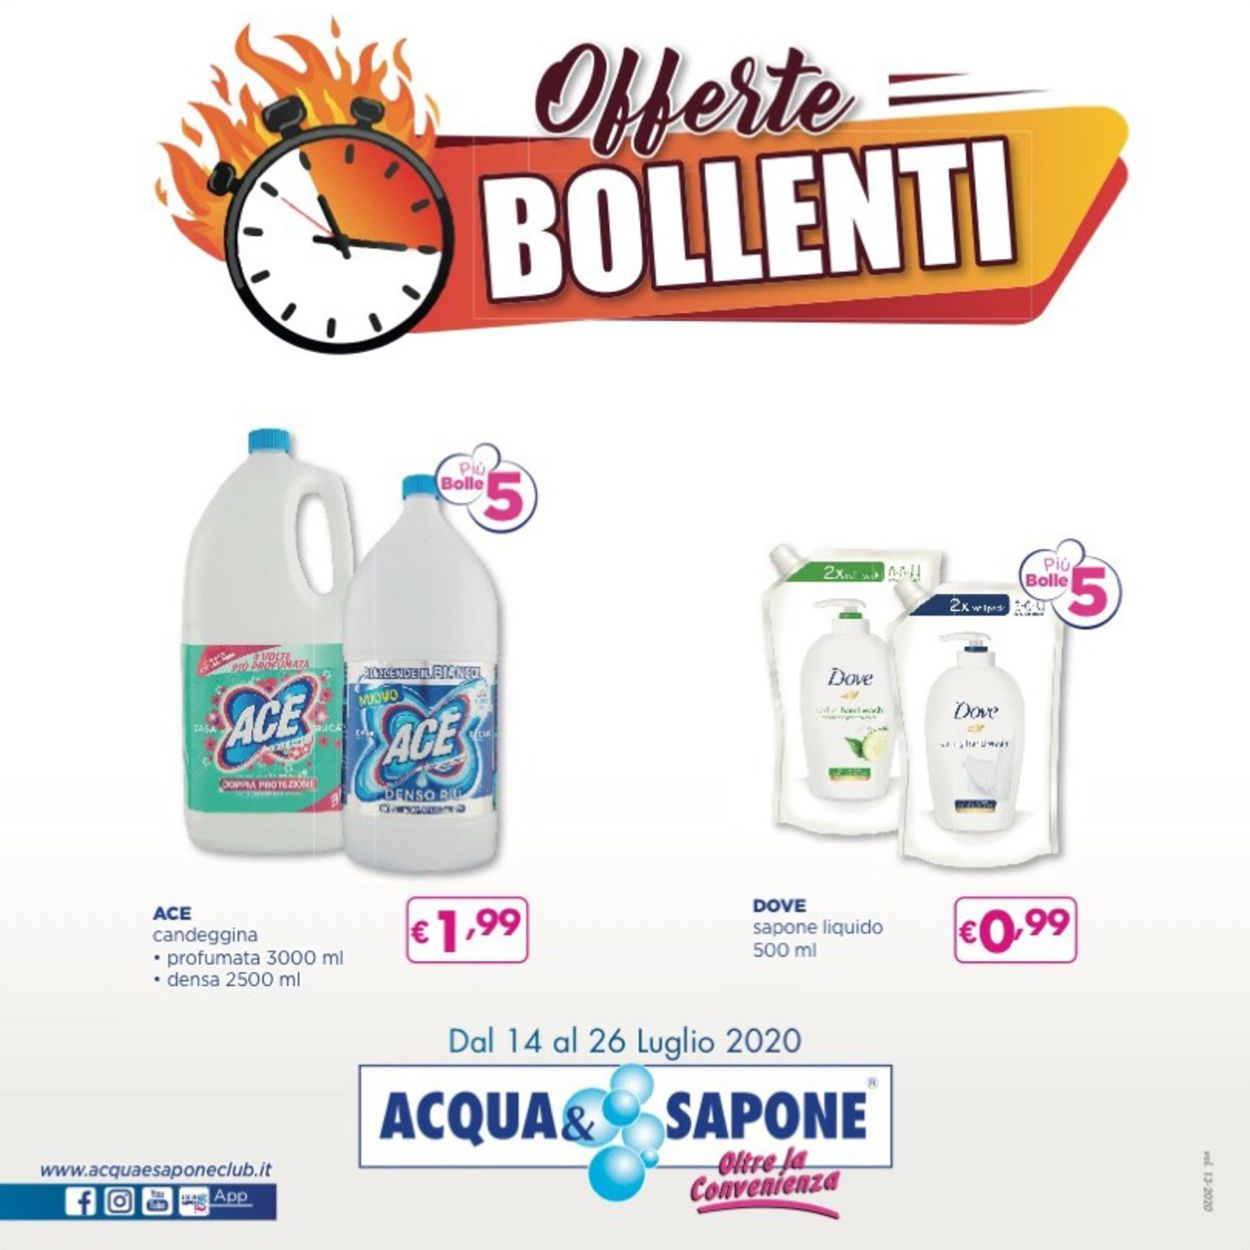 Volantino Acqua & Sapone - Offerte 14/07-26/07/2020